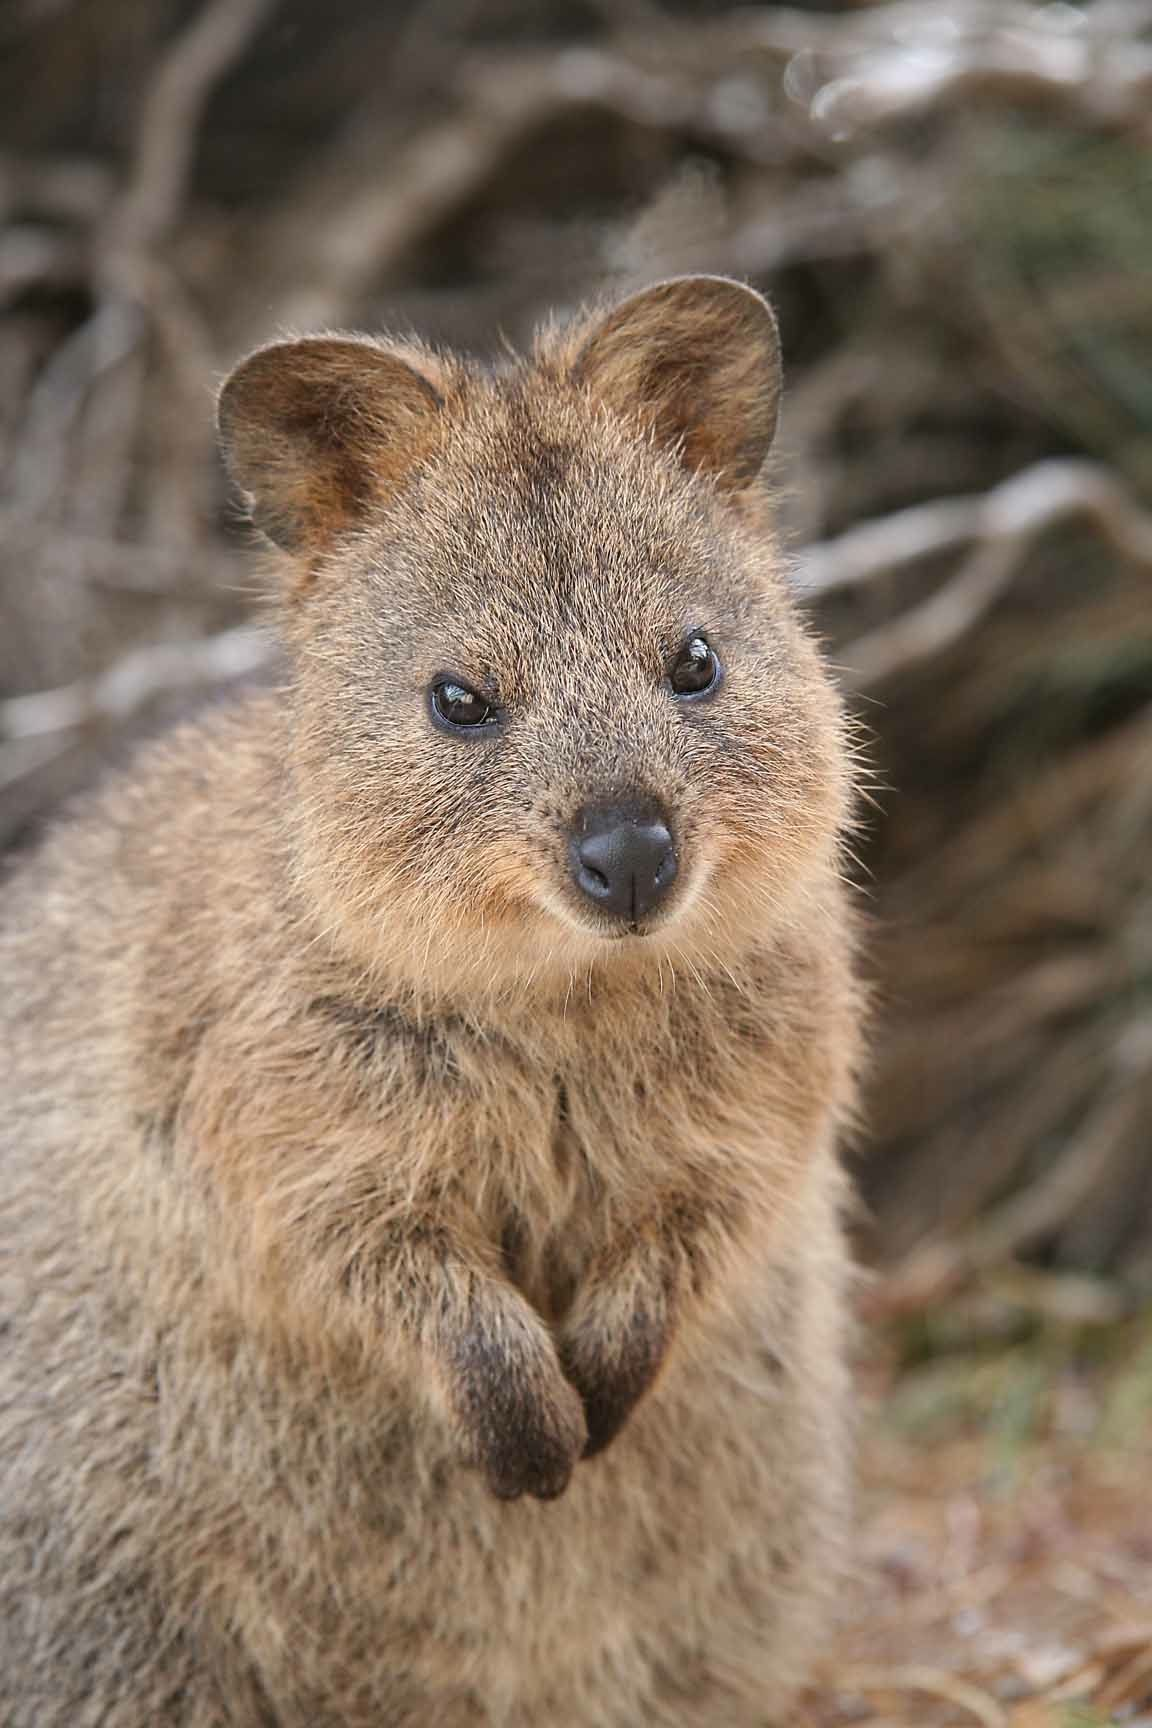 Quokka at Rottnest 2 Australian animals, Australia